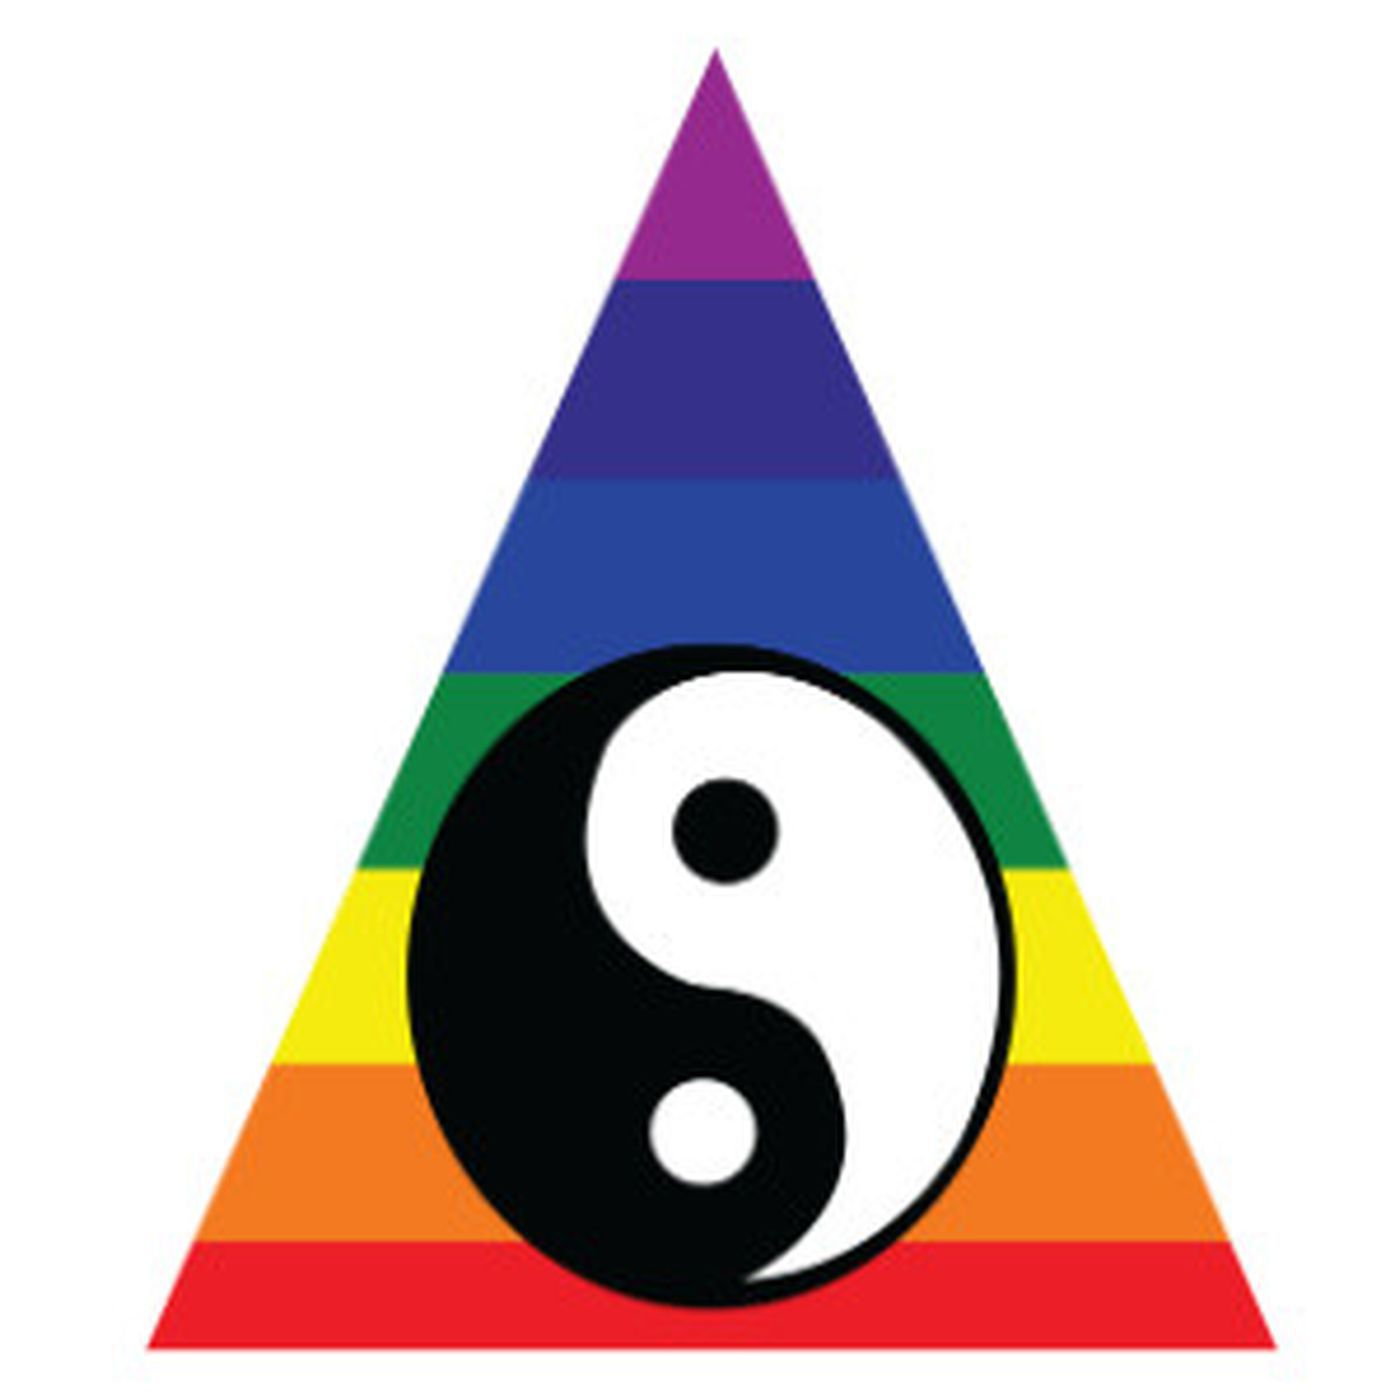 Spiritual Guidance from MeetYourPsychic.com